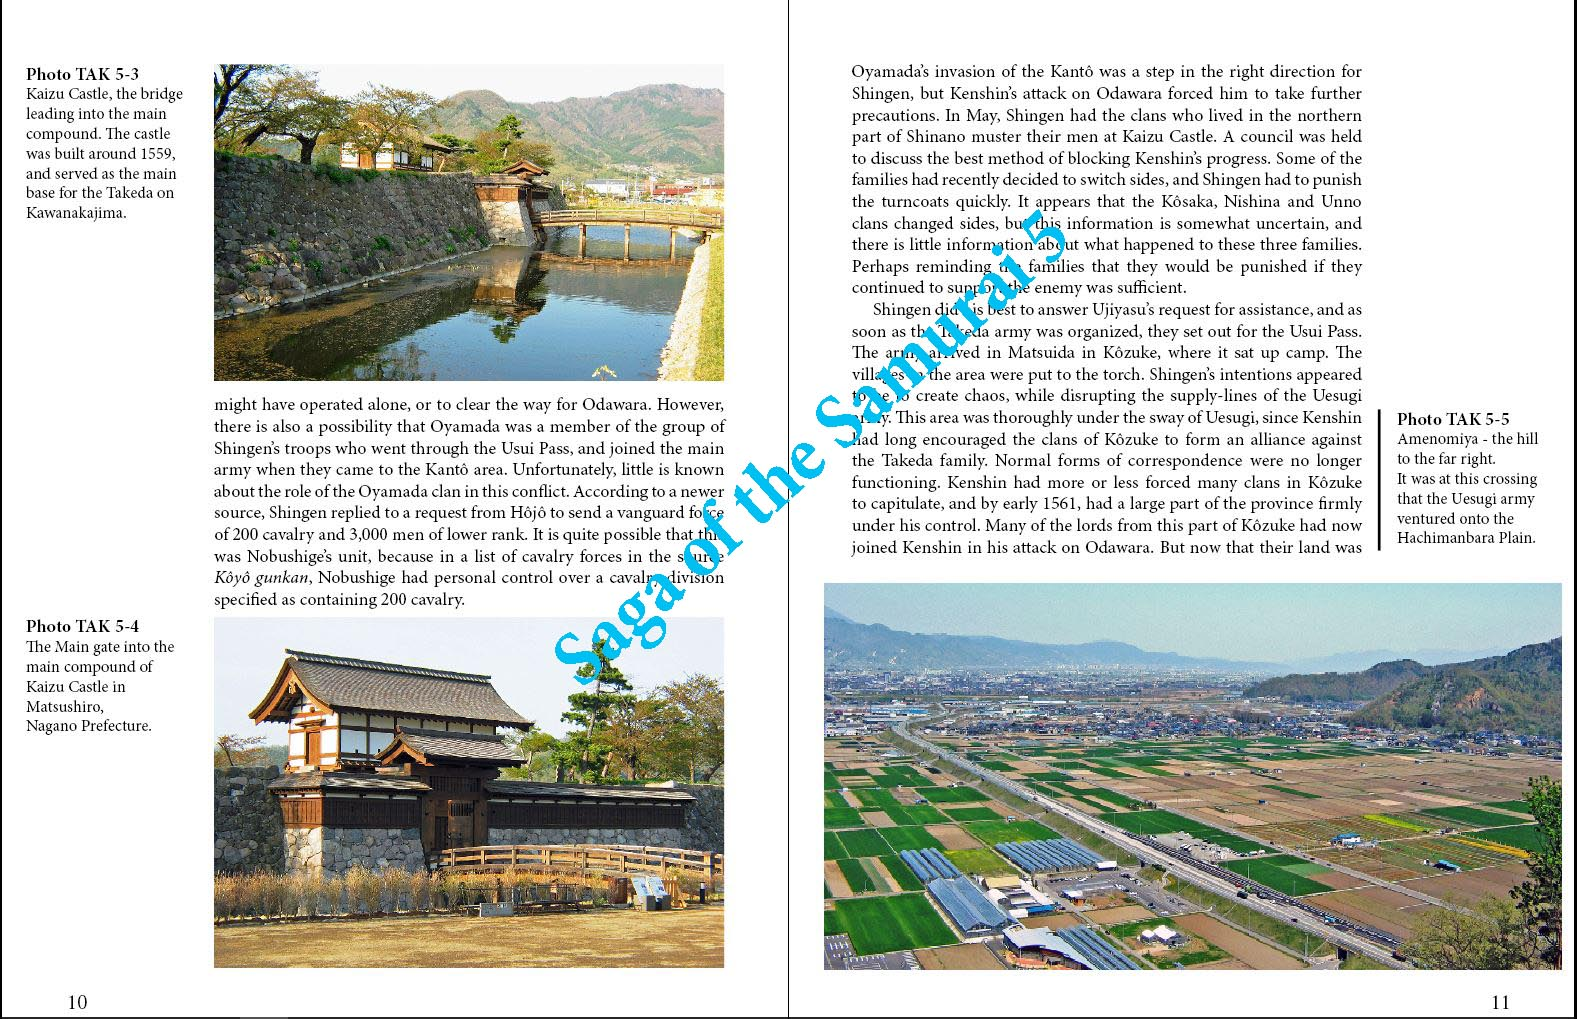 saga of the samurai 5 photo 02